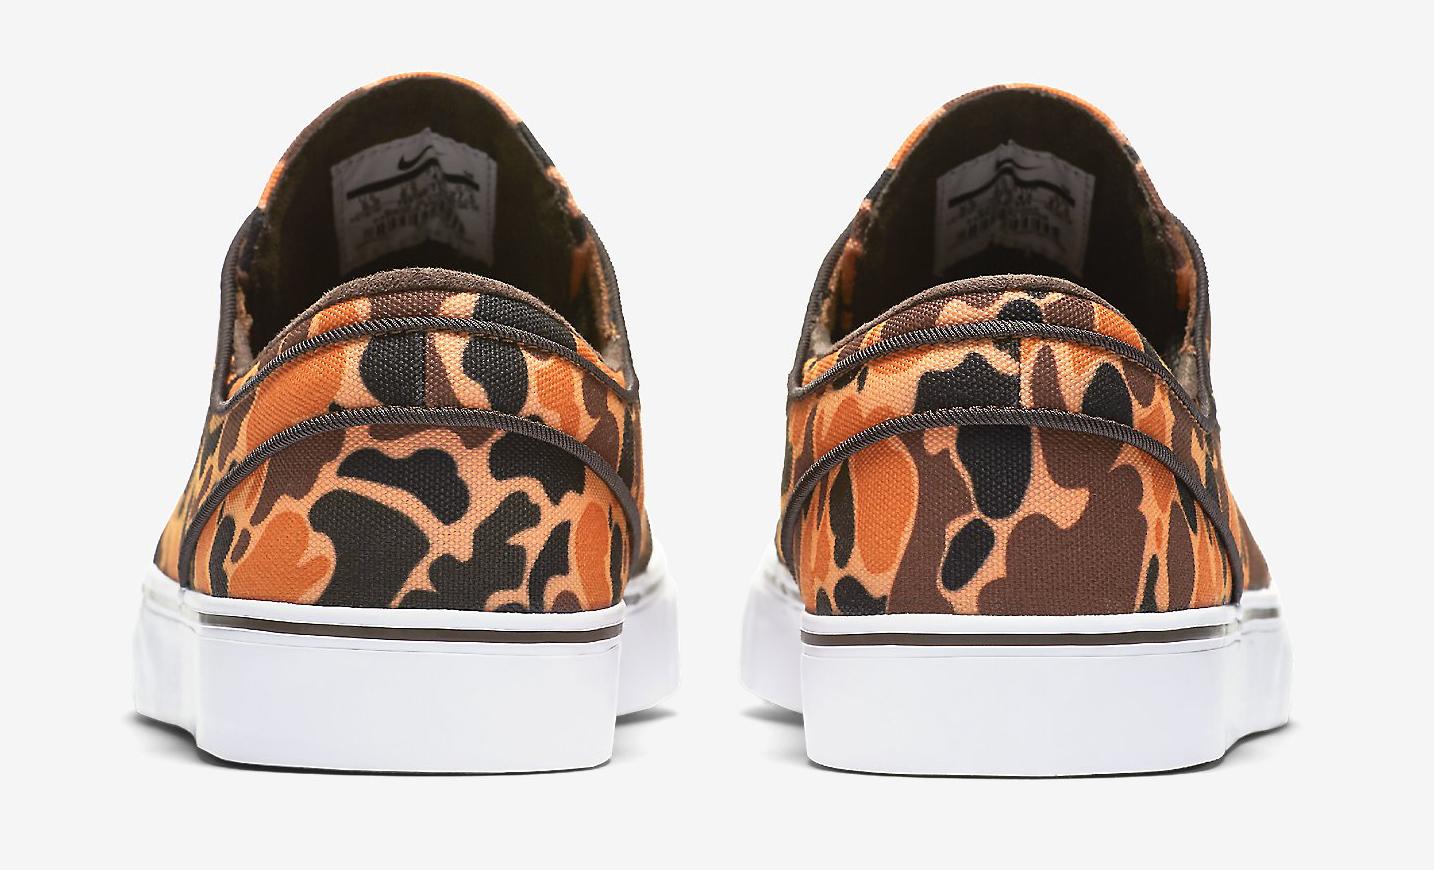 Camouflage Nike SB Janoski Heel